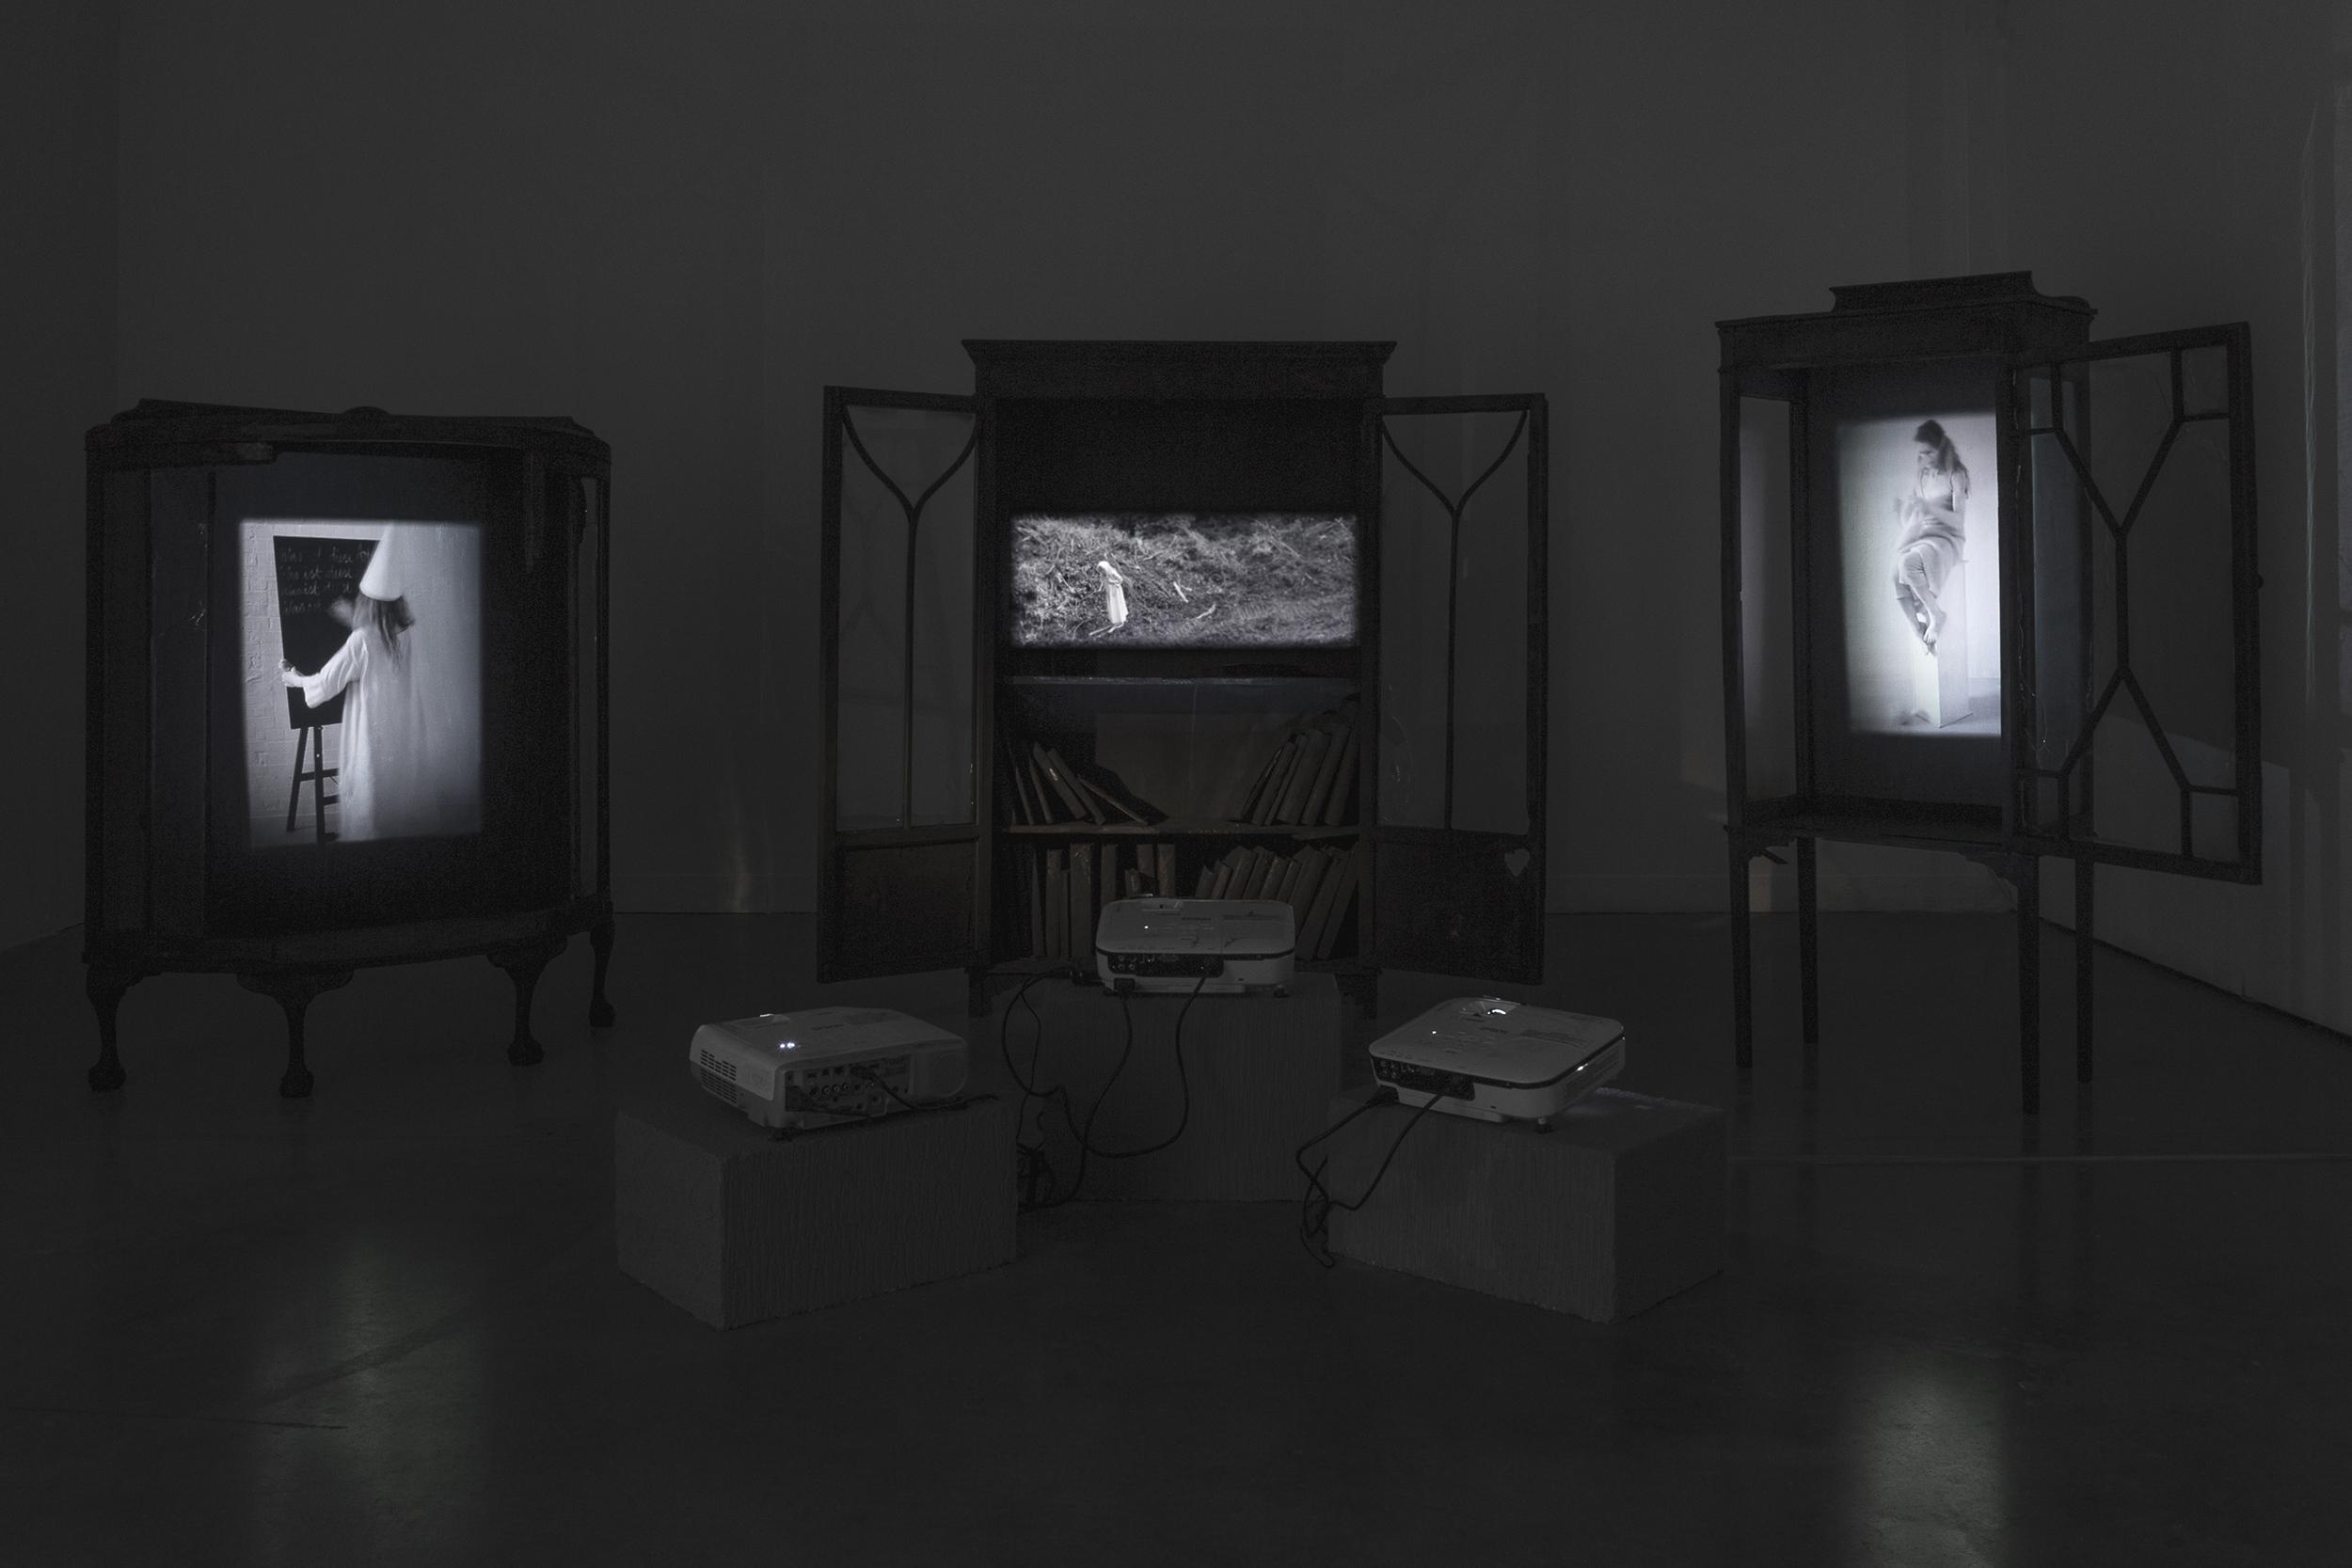 Professional Doctorate Fine Art Showcase installation, Ali Darke